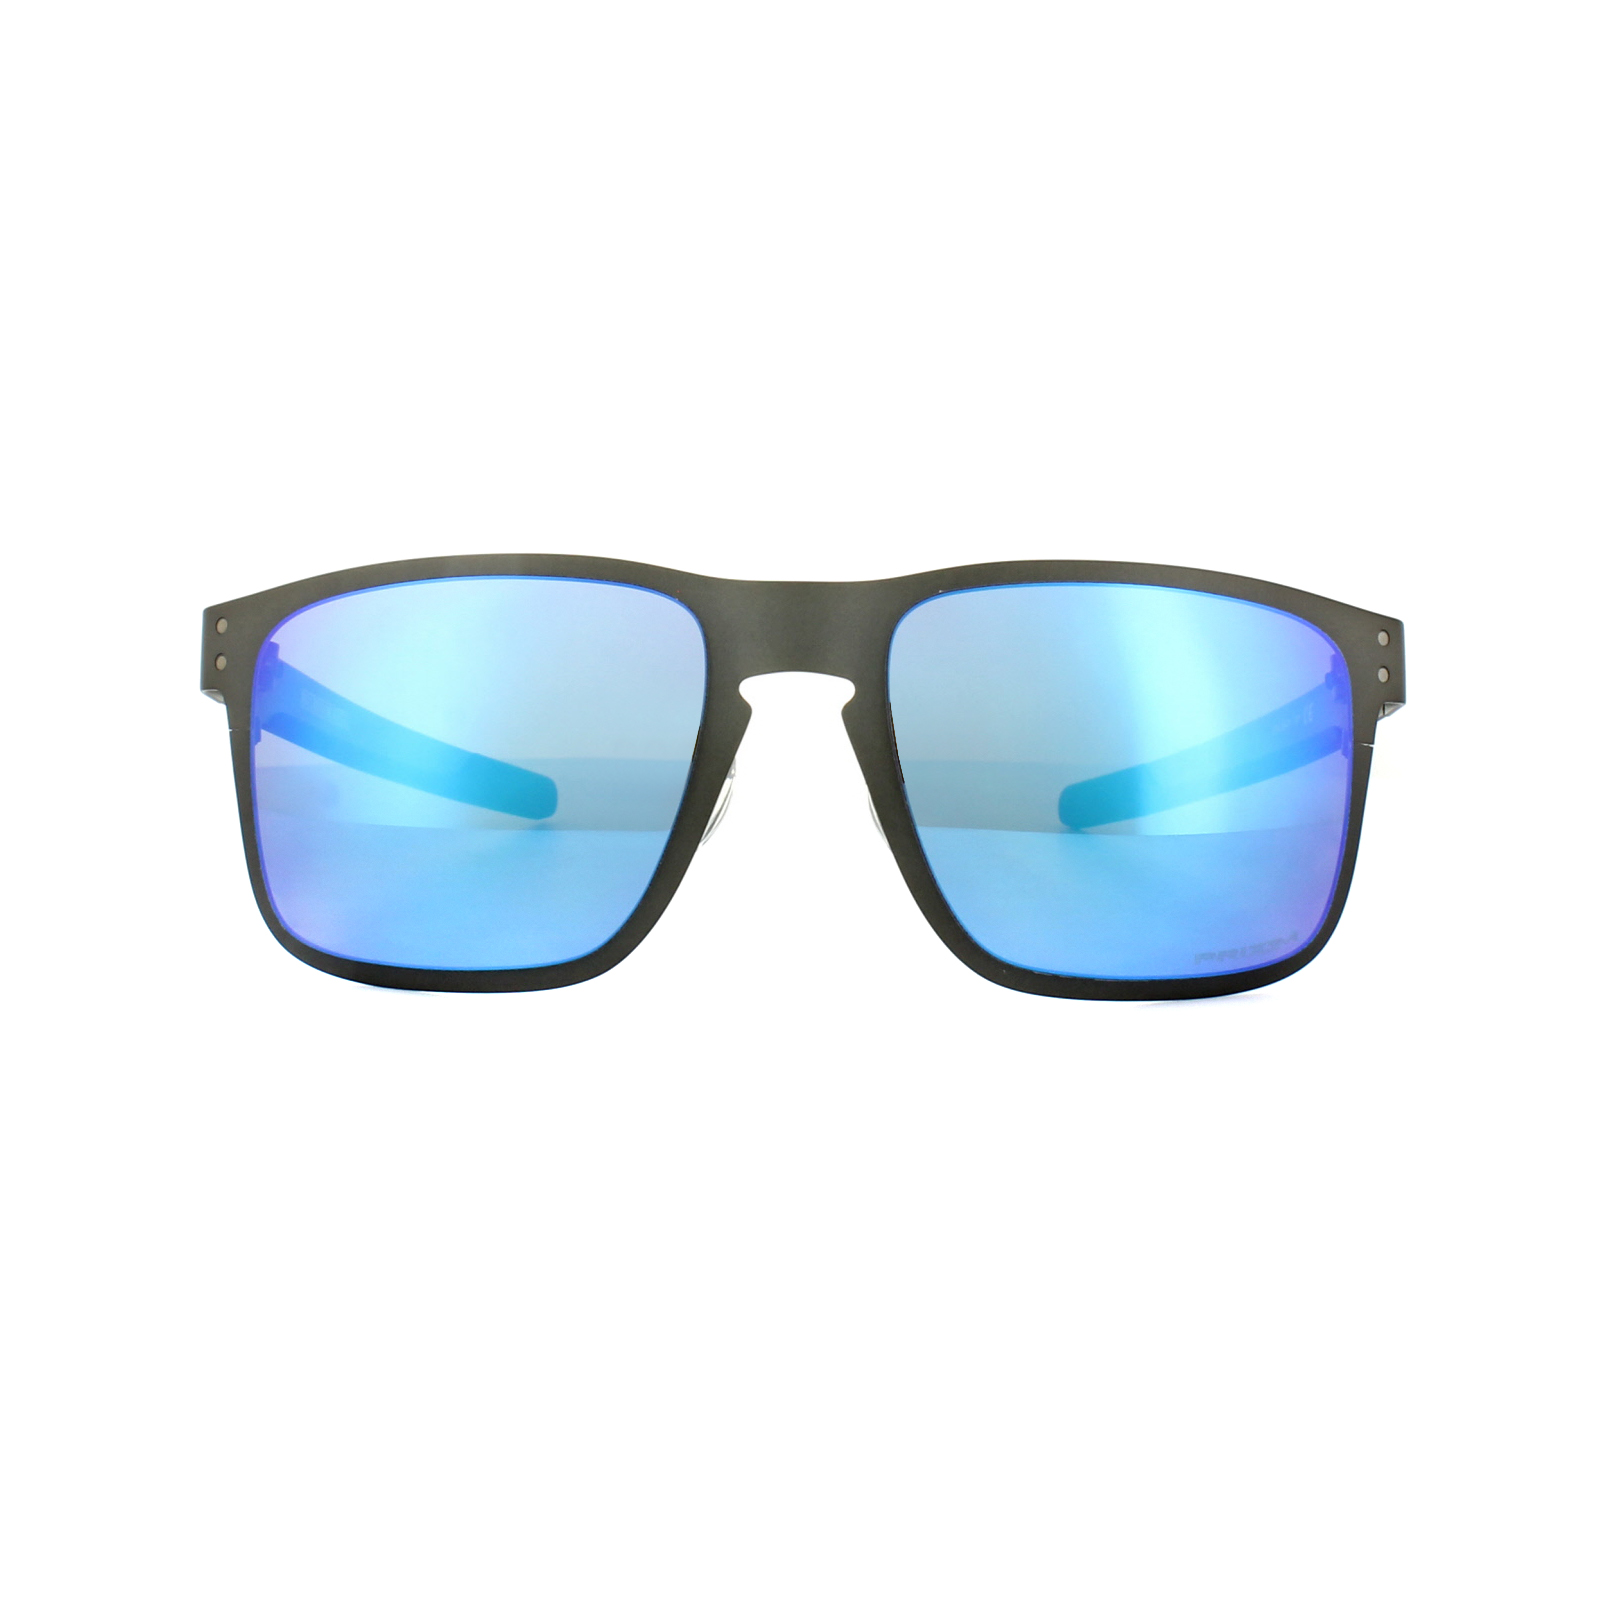 6ed47f52f9 Sentinel Oakley Sunglasses Holbrook Metal OO4123-07 Gunmetal Prizm Sapphire  Polarized